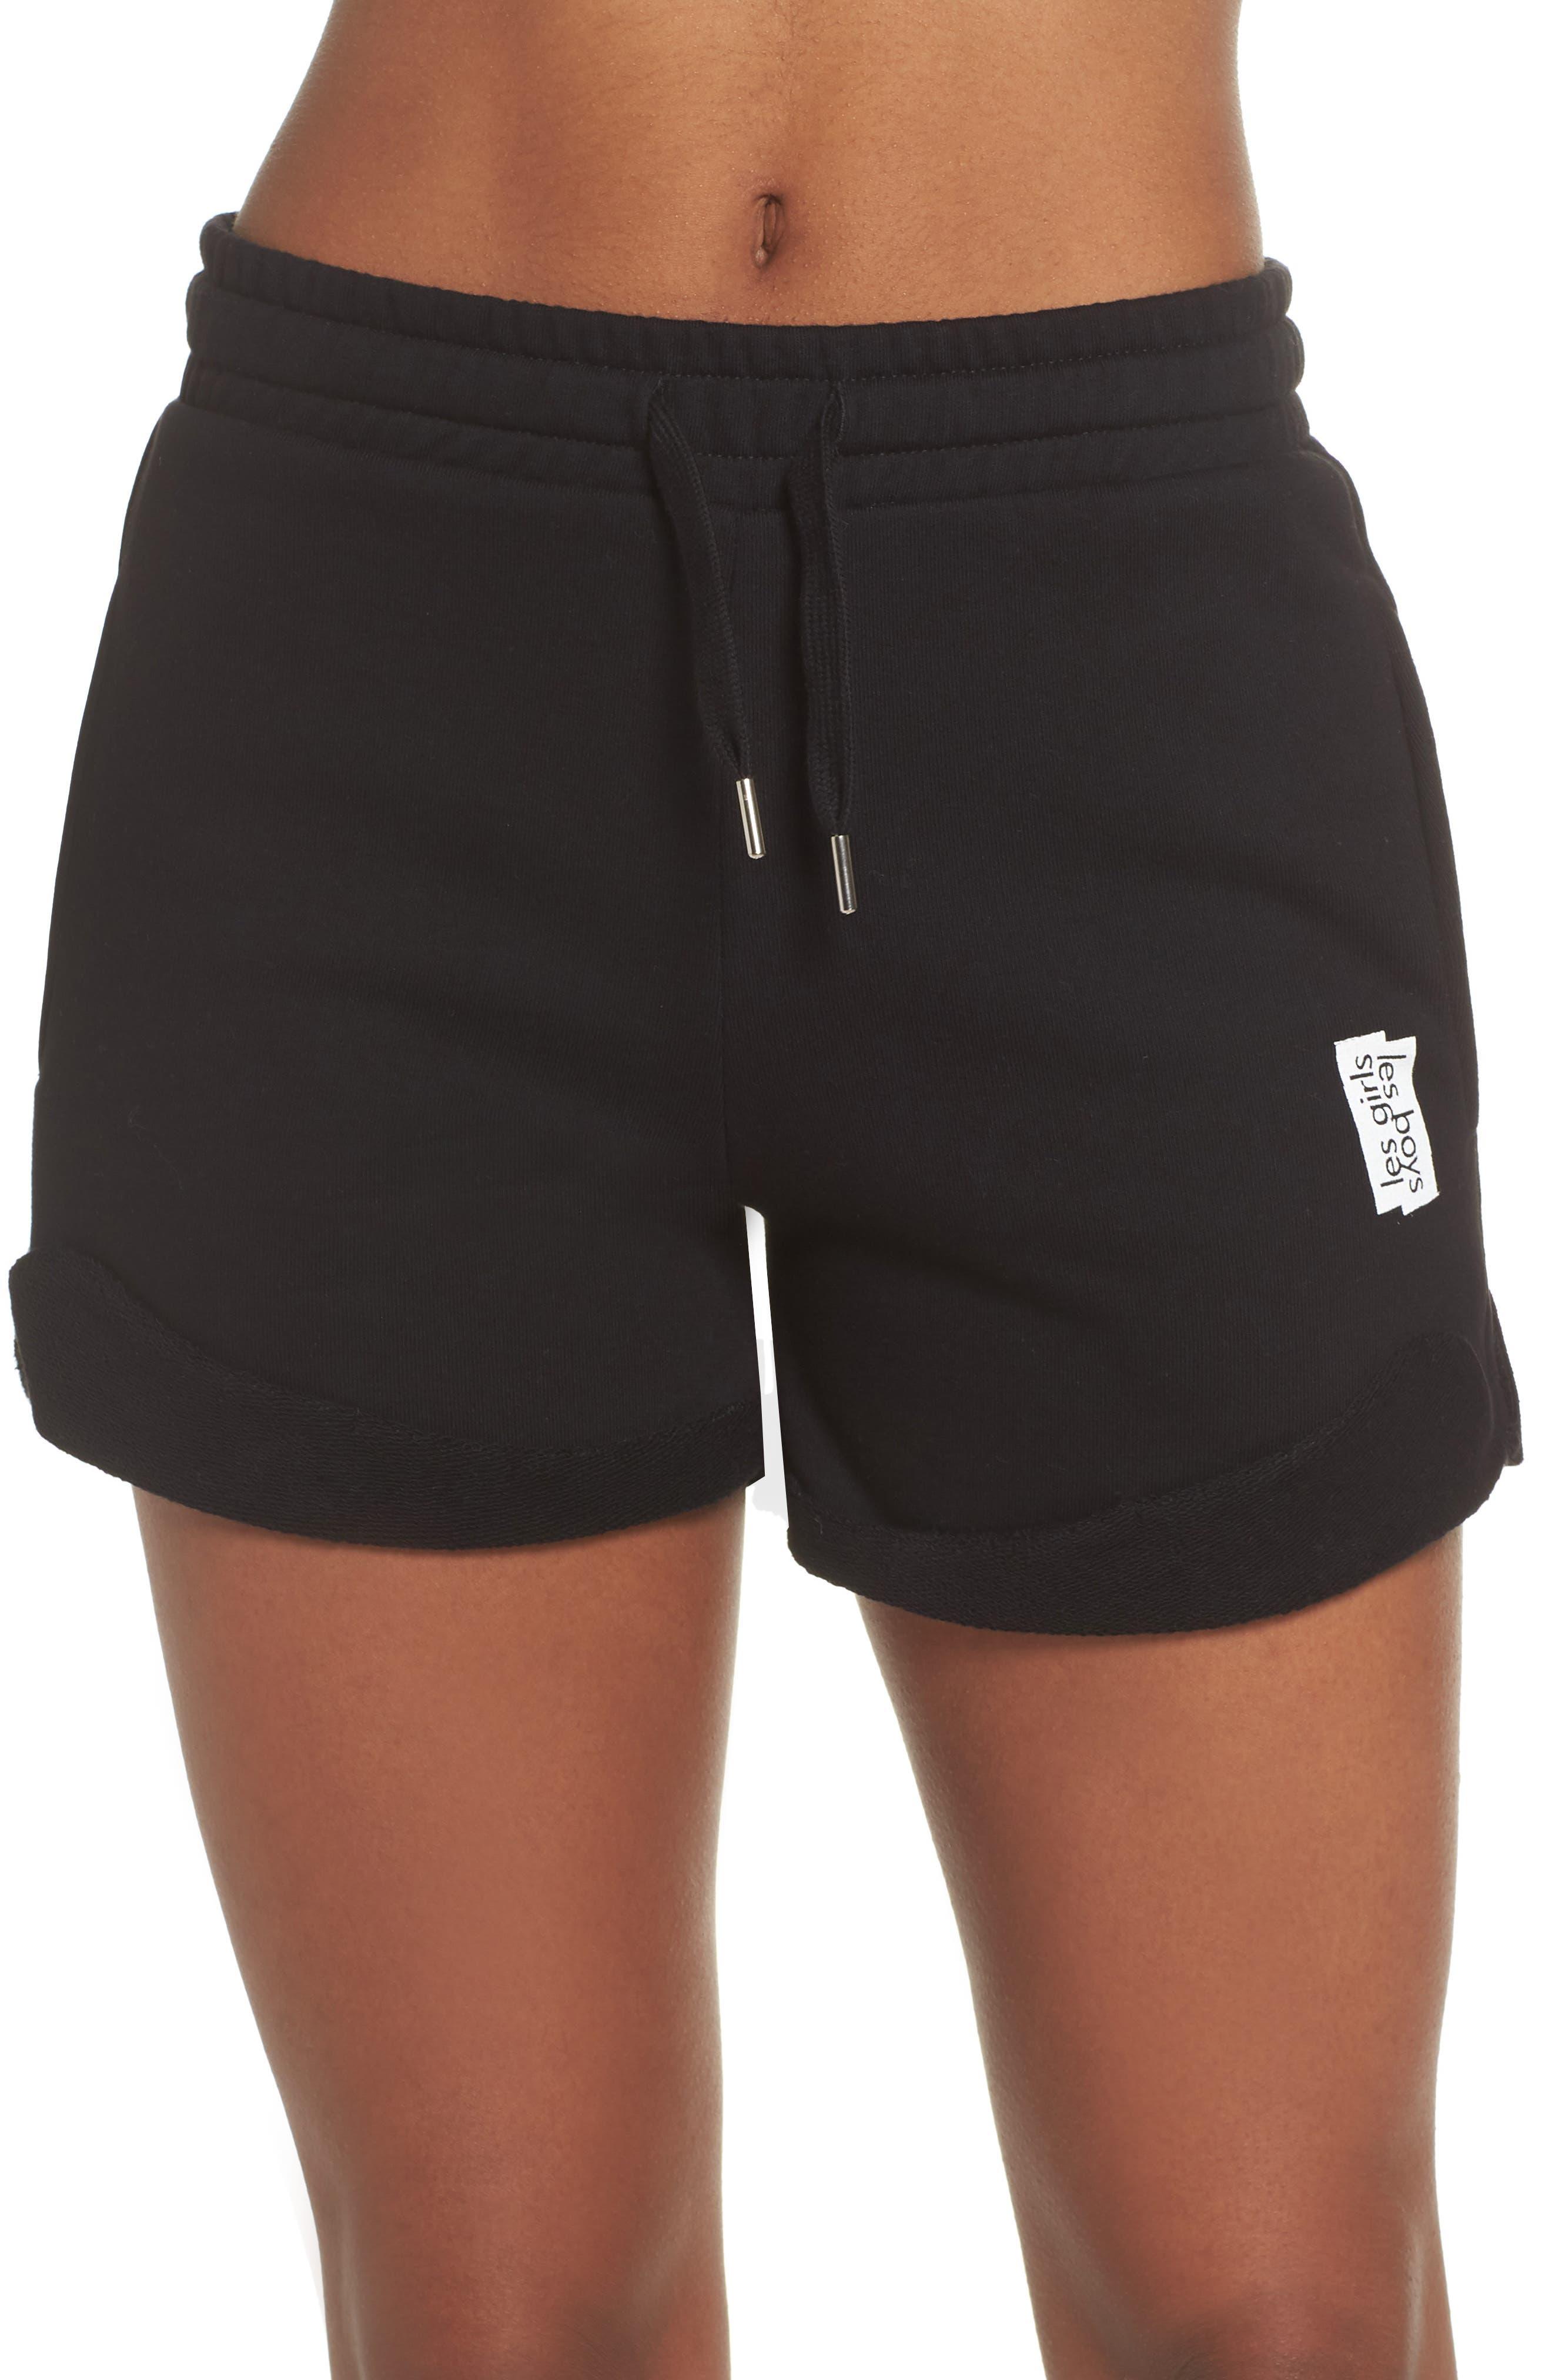 French Terry High Waist Shorts,                             Main thumbnail 1, color,                             Black